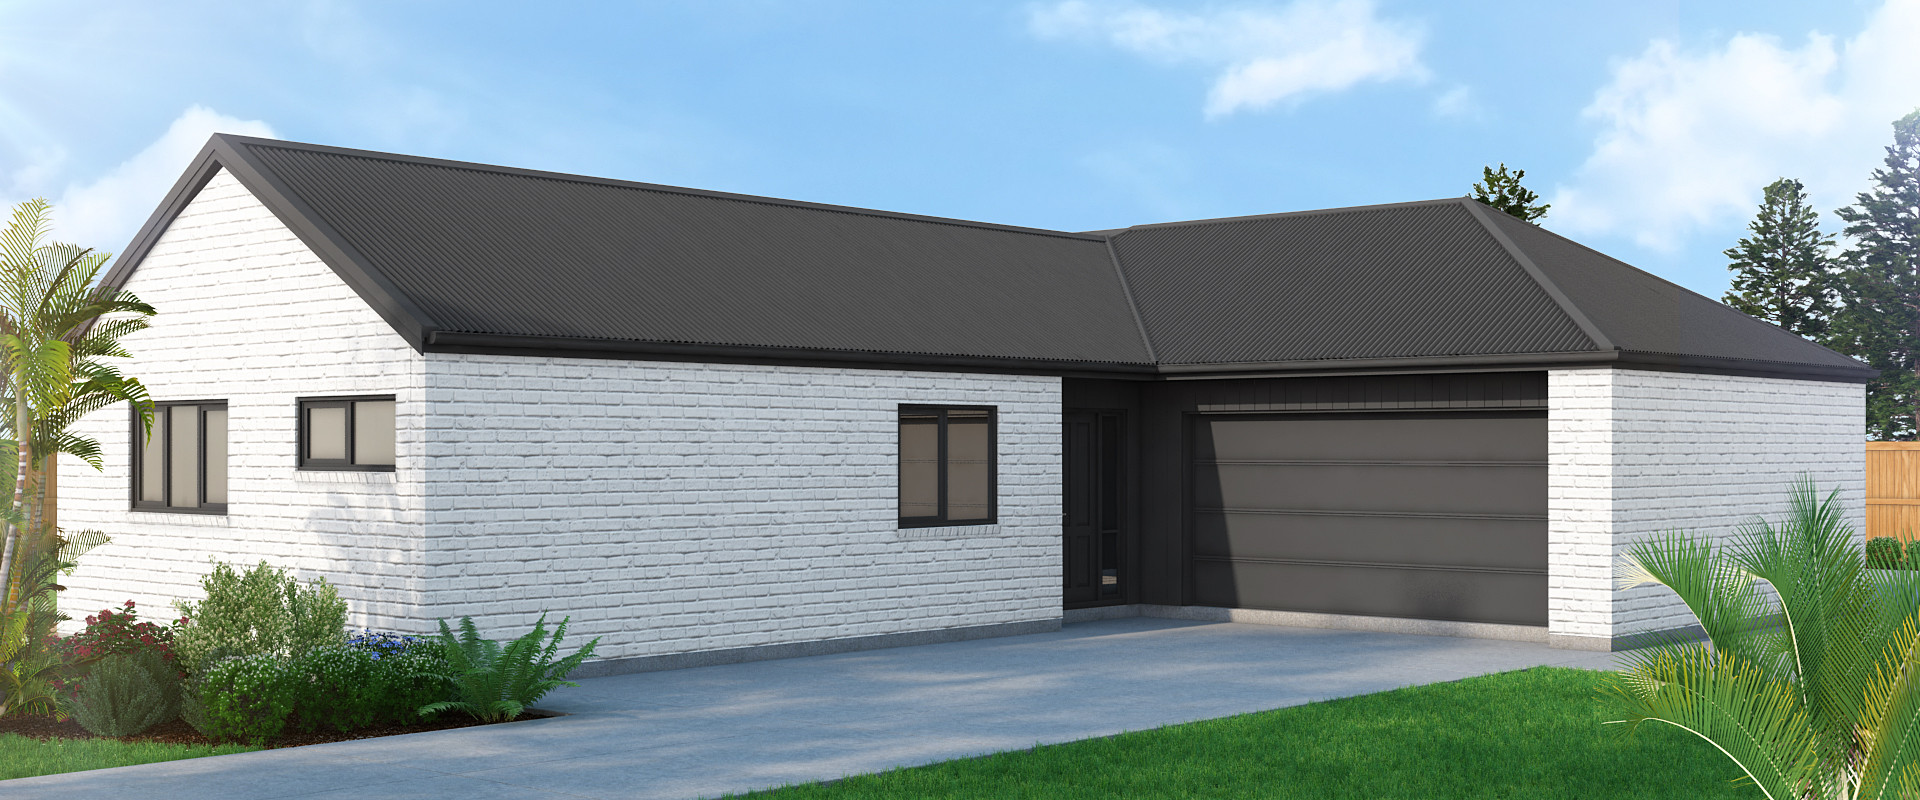 Barton Fields back exterior render